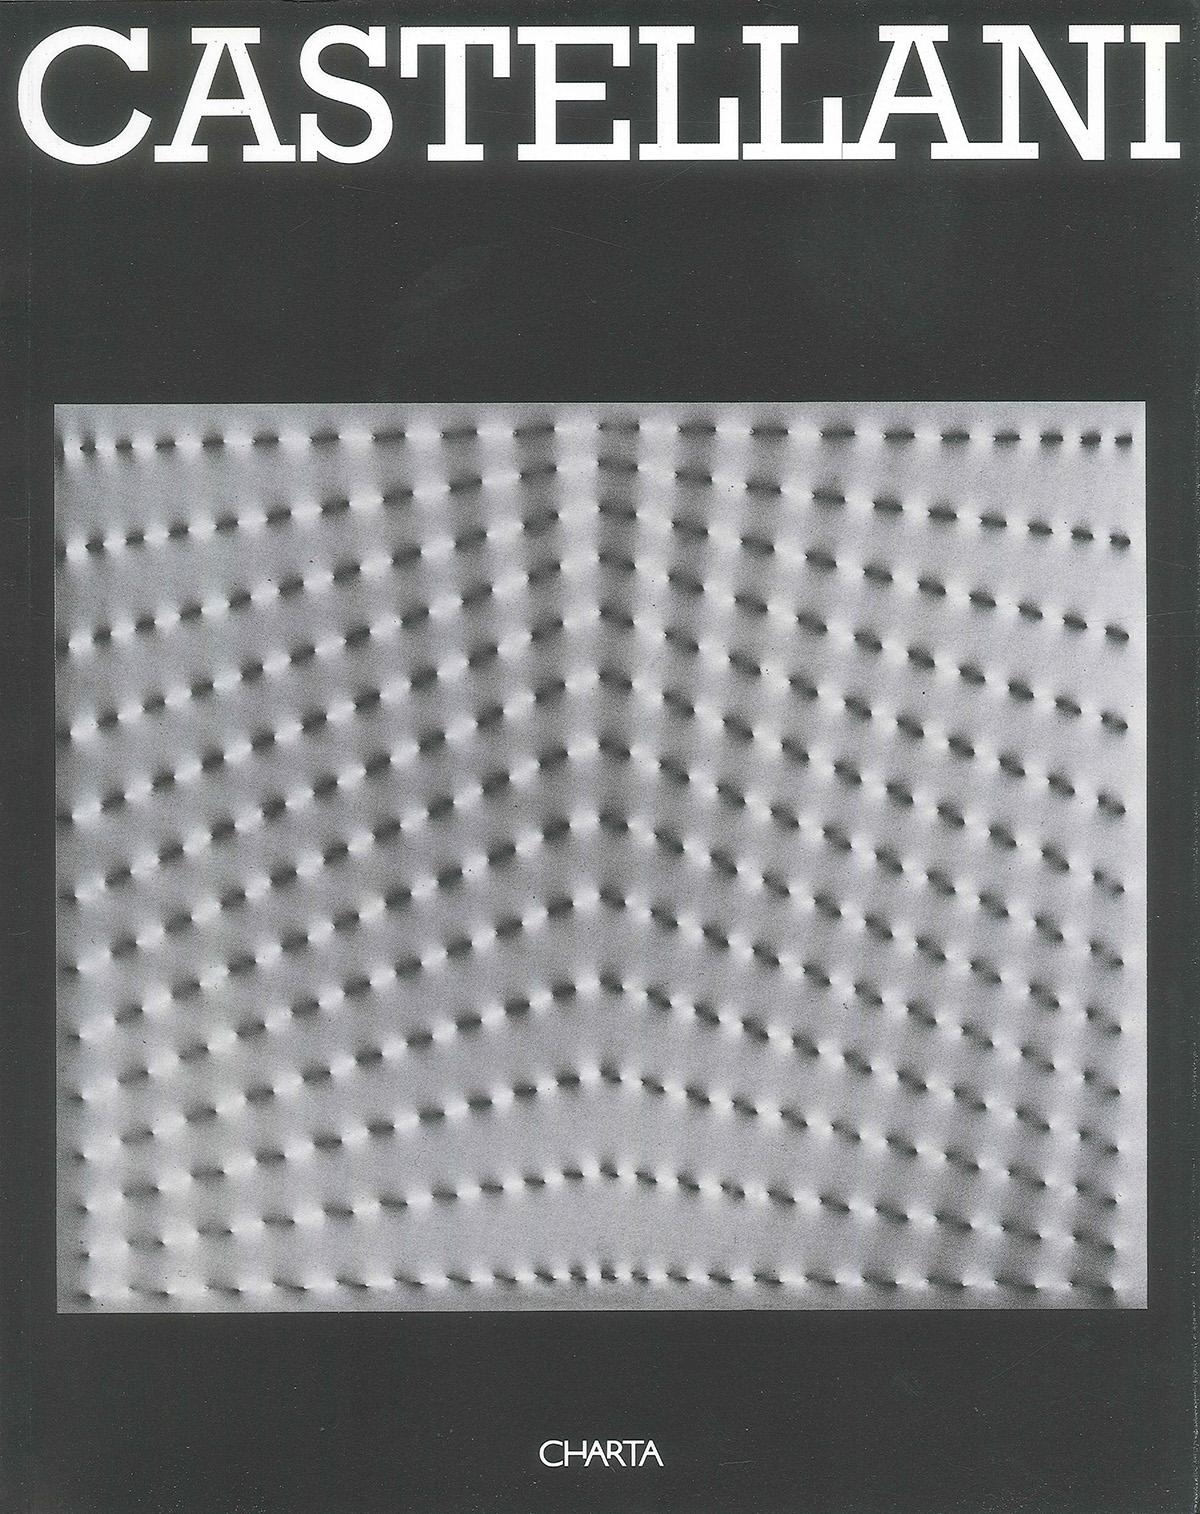 18 a - 1996